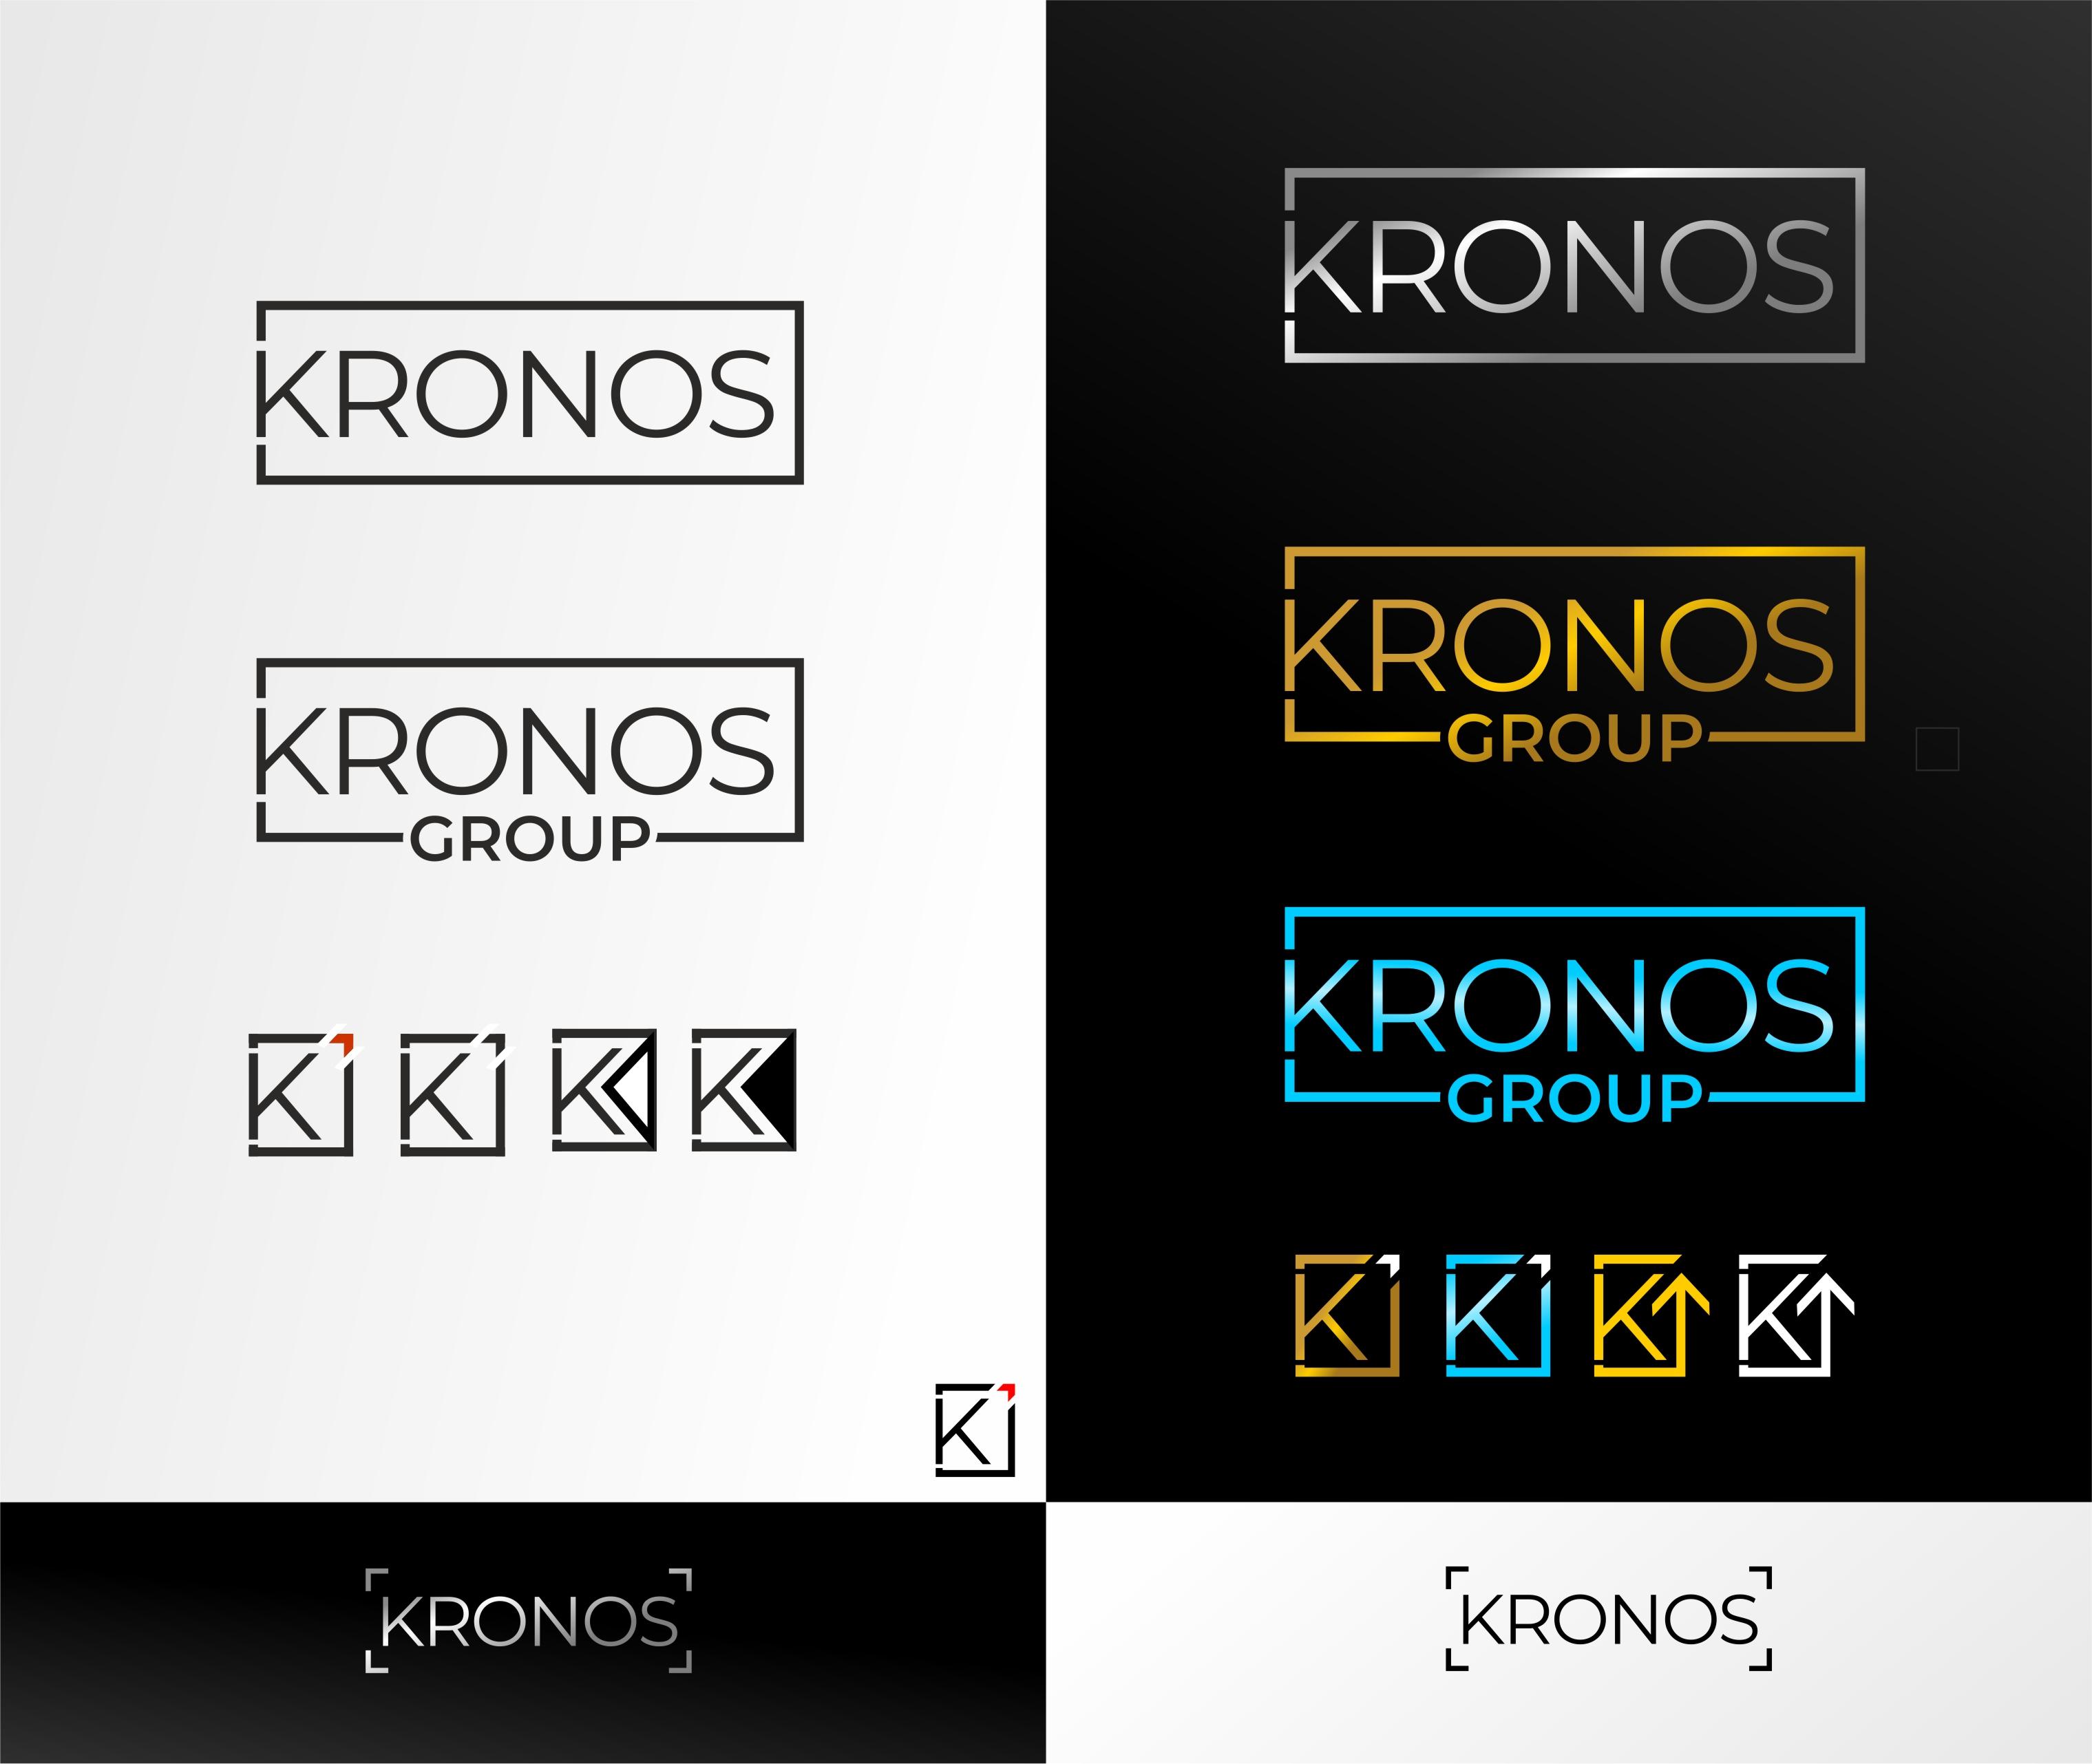 Разработать логотип KRONOS фото f_0525fb0d037e42f8.jpg